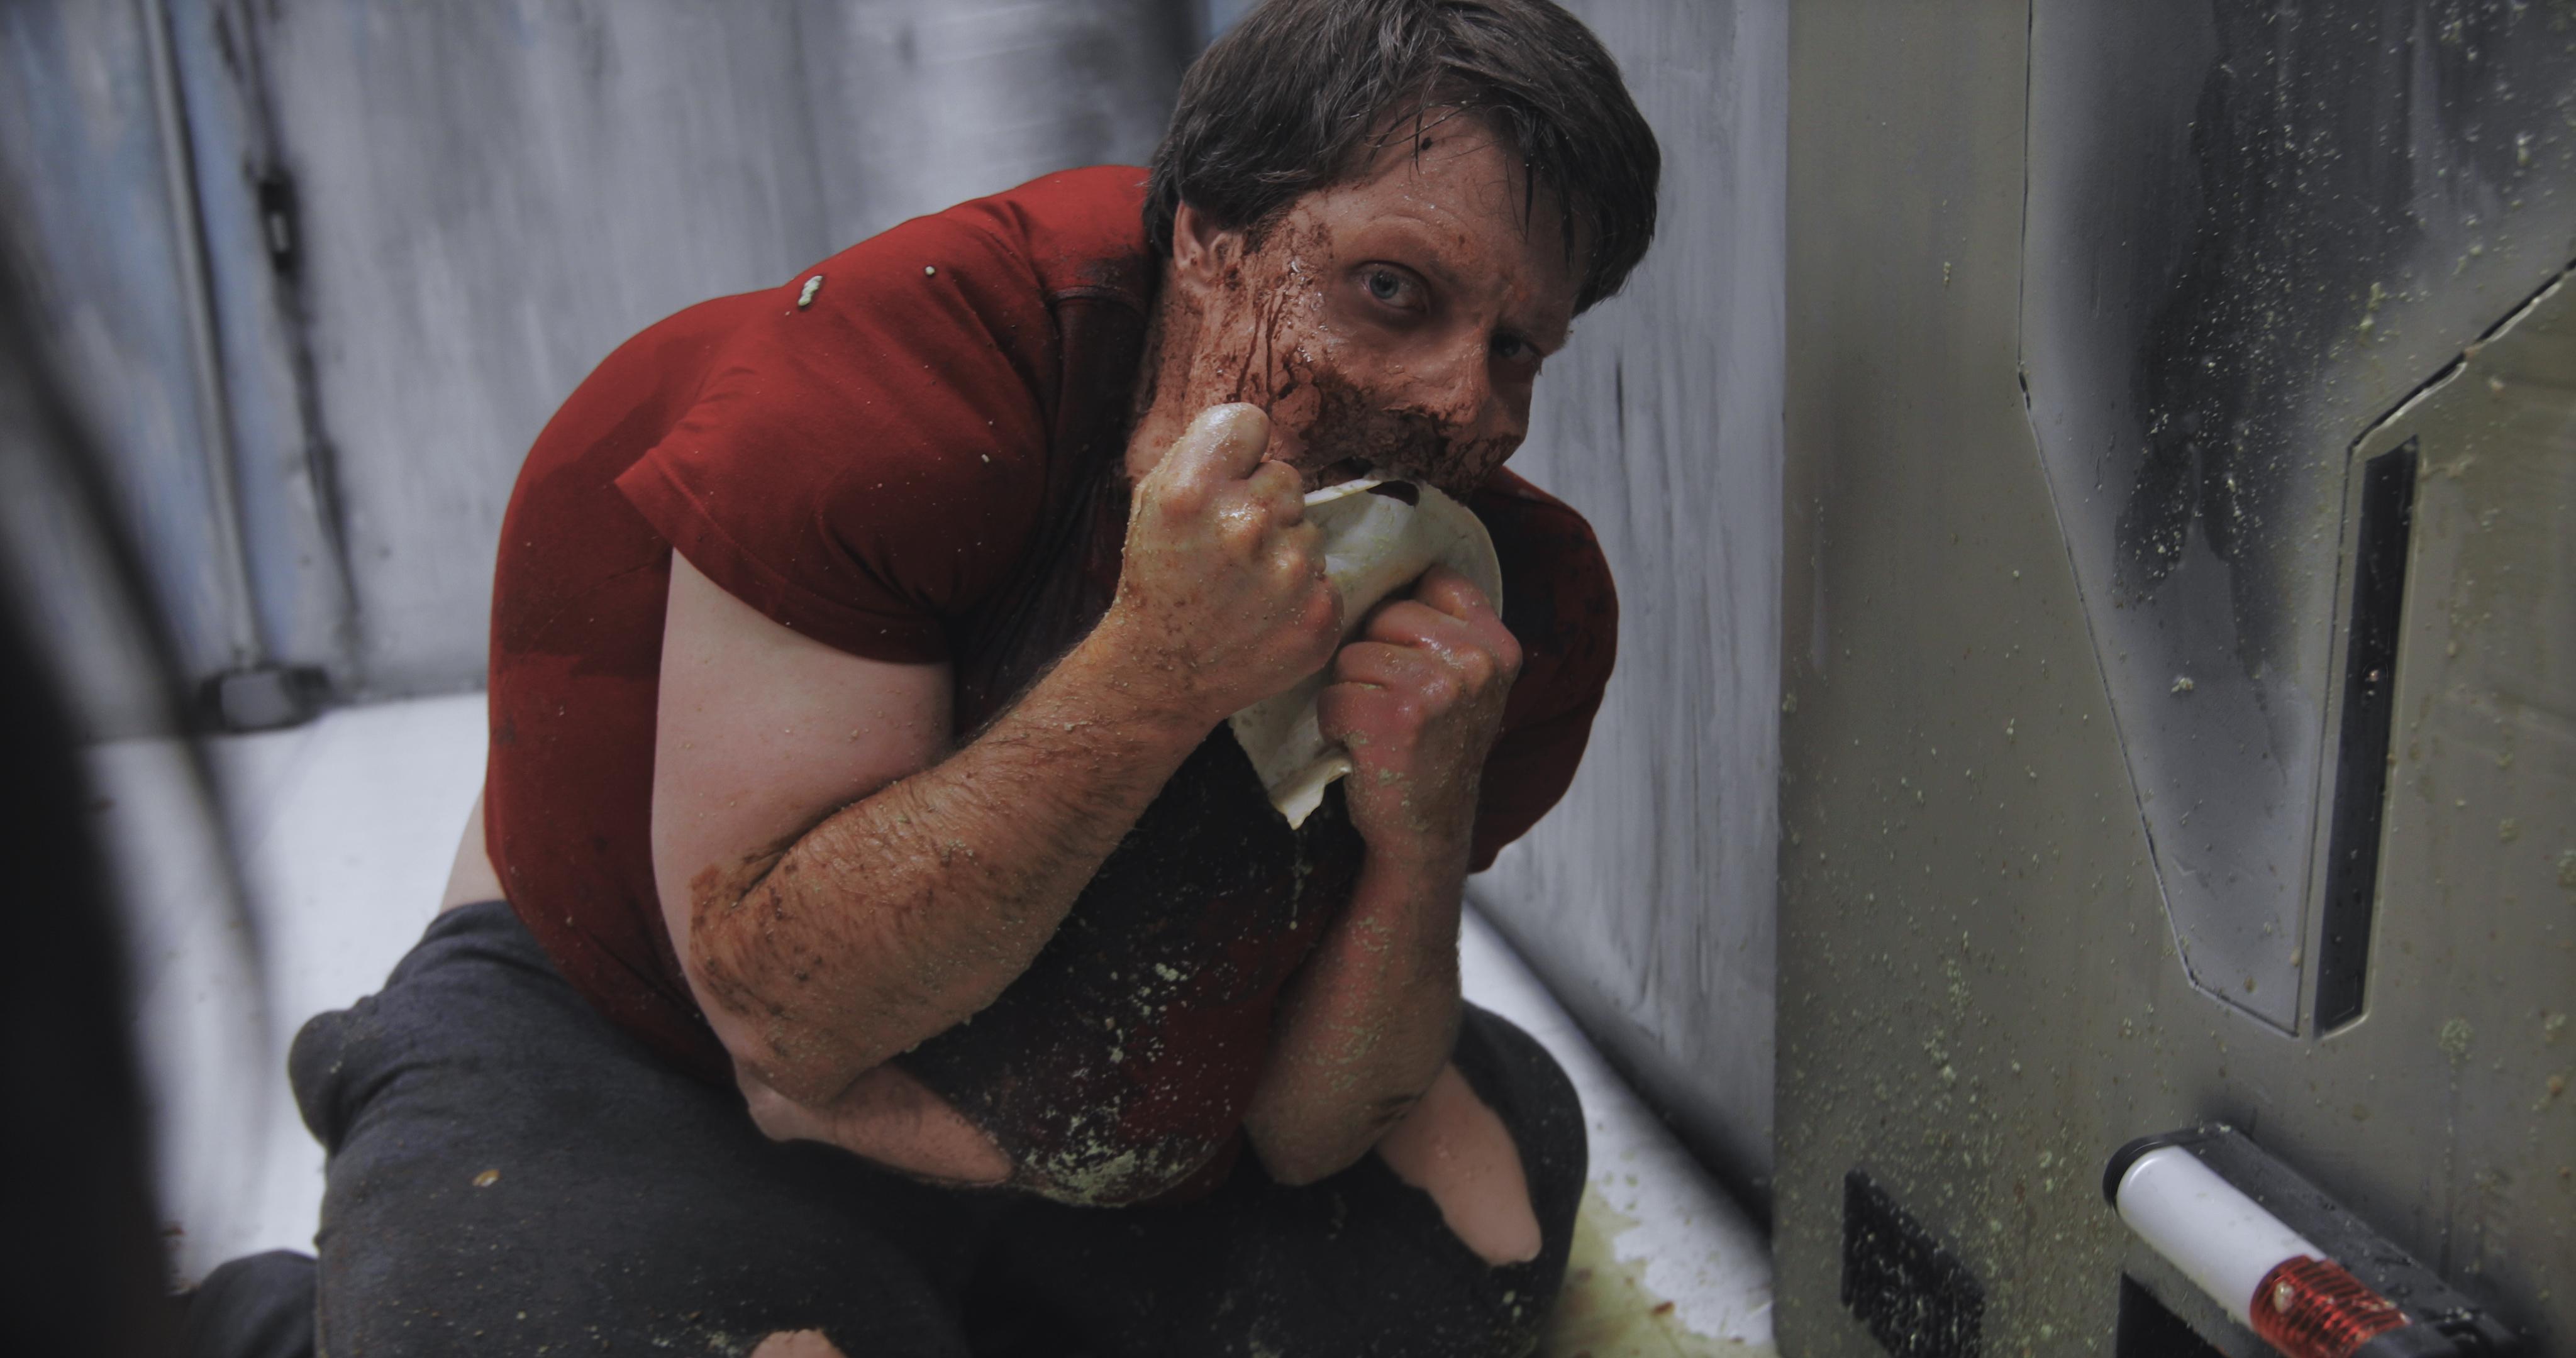 Portland Horror Film Festival: FIVE COURSE MEAL